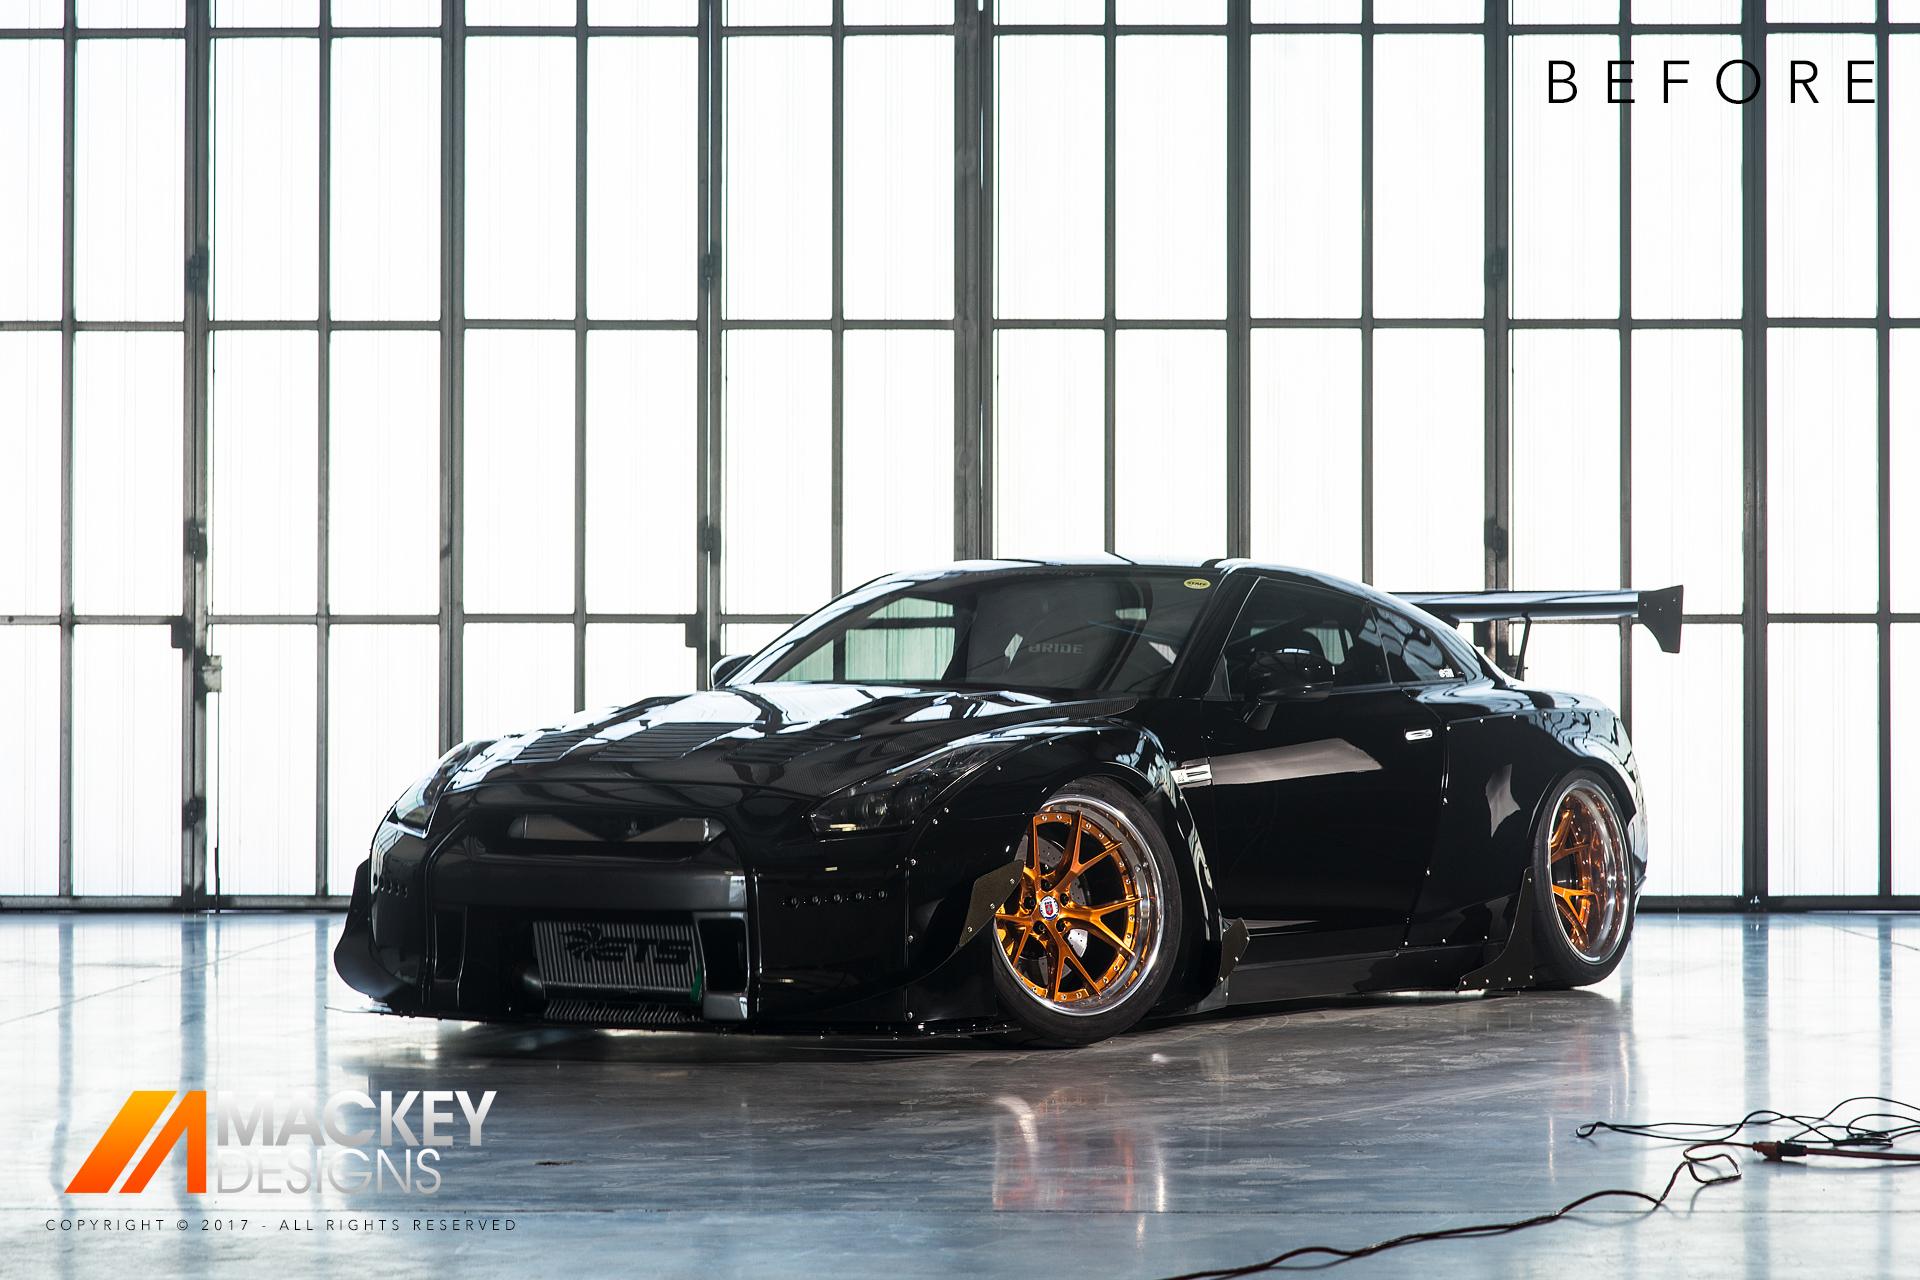 Automotive Photographer - Seattle - Josh Mackey - Rocket Bunny Nissan GTR R35 Before